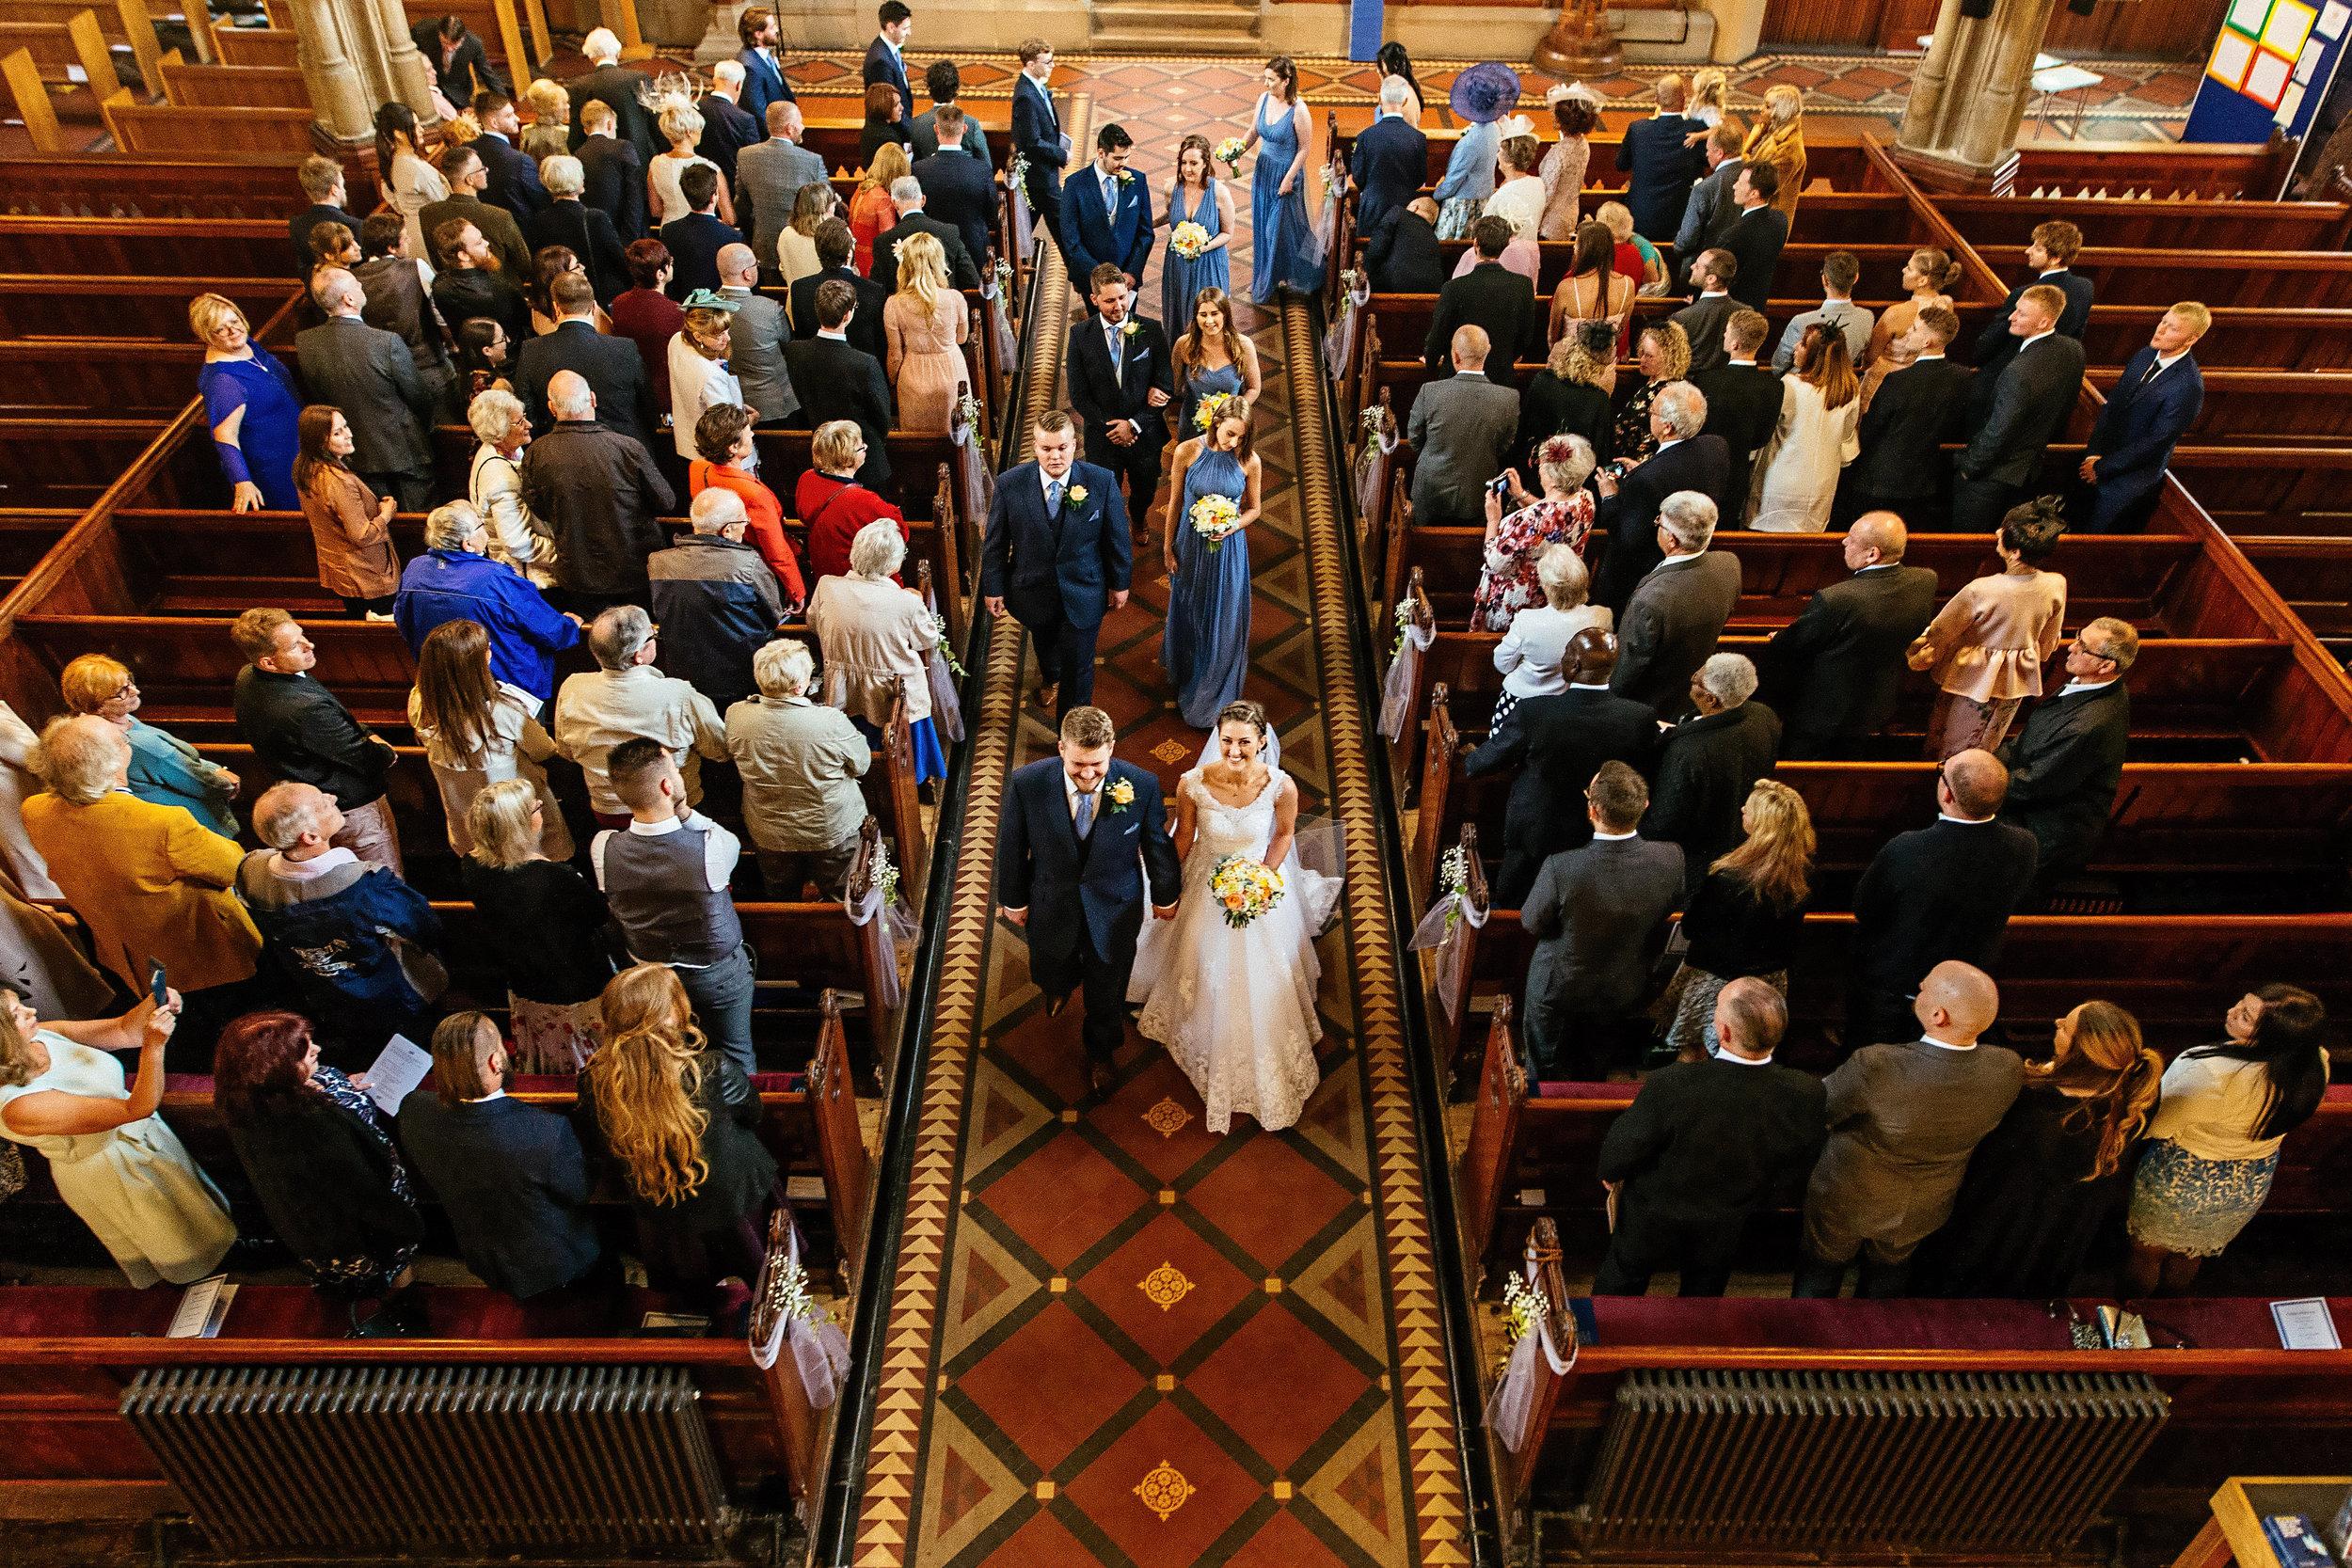 Kathryn-and-Mike-Wedding-Highlights-33.jpg